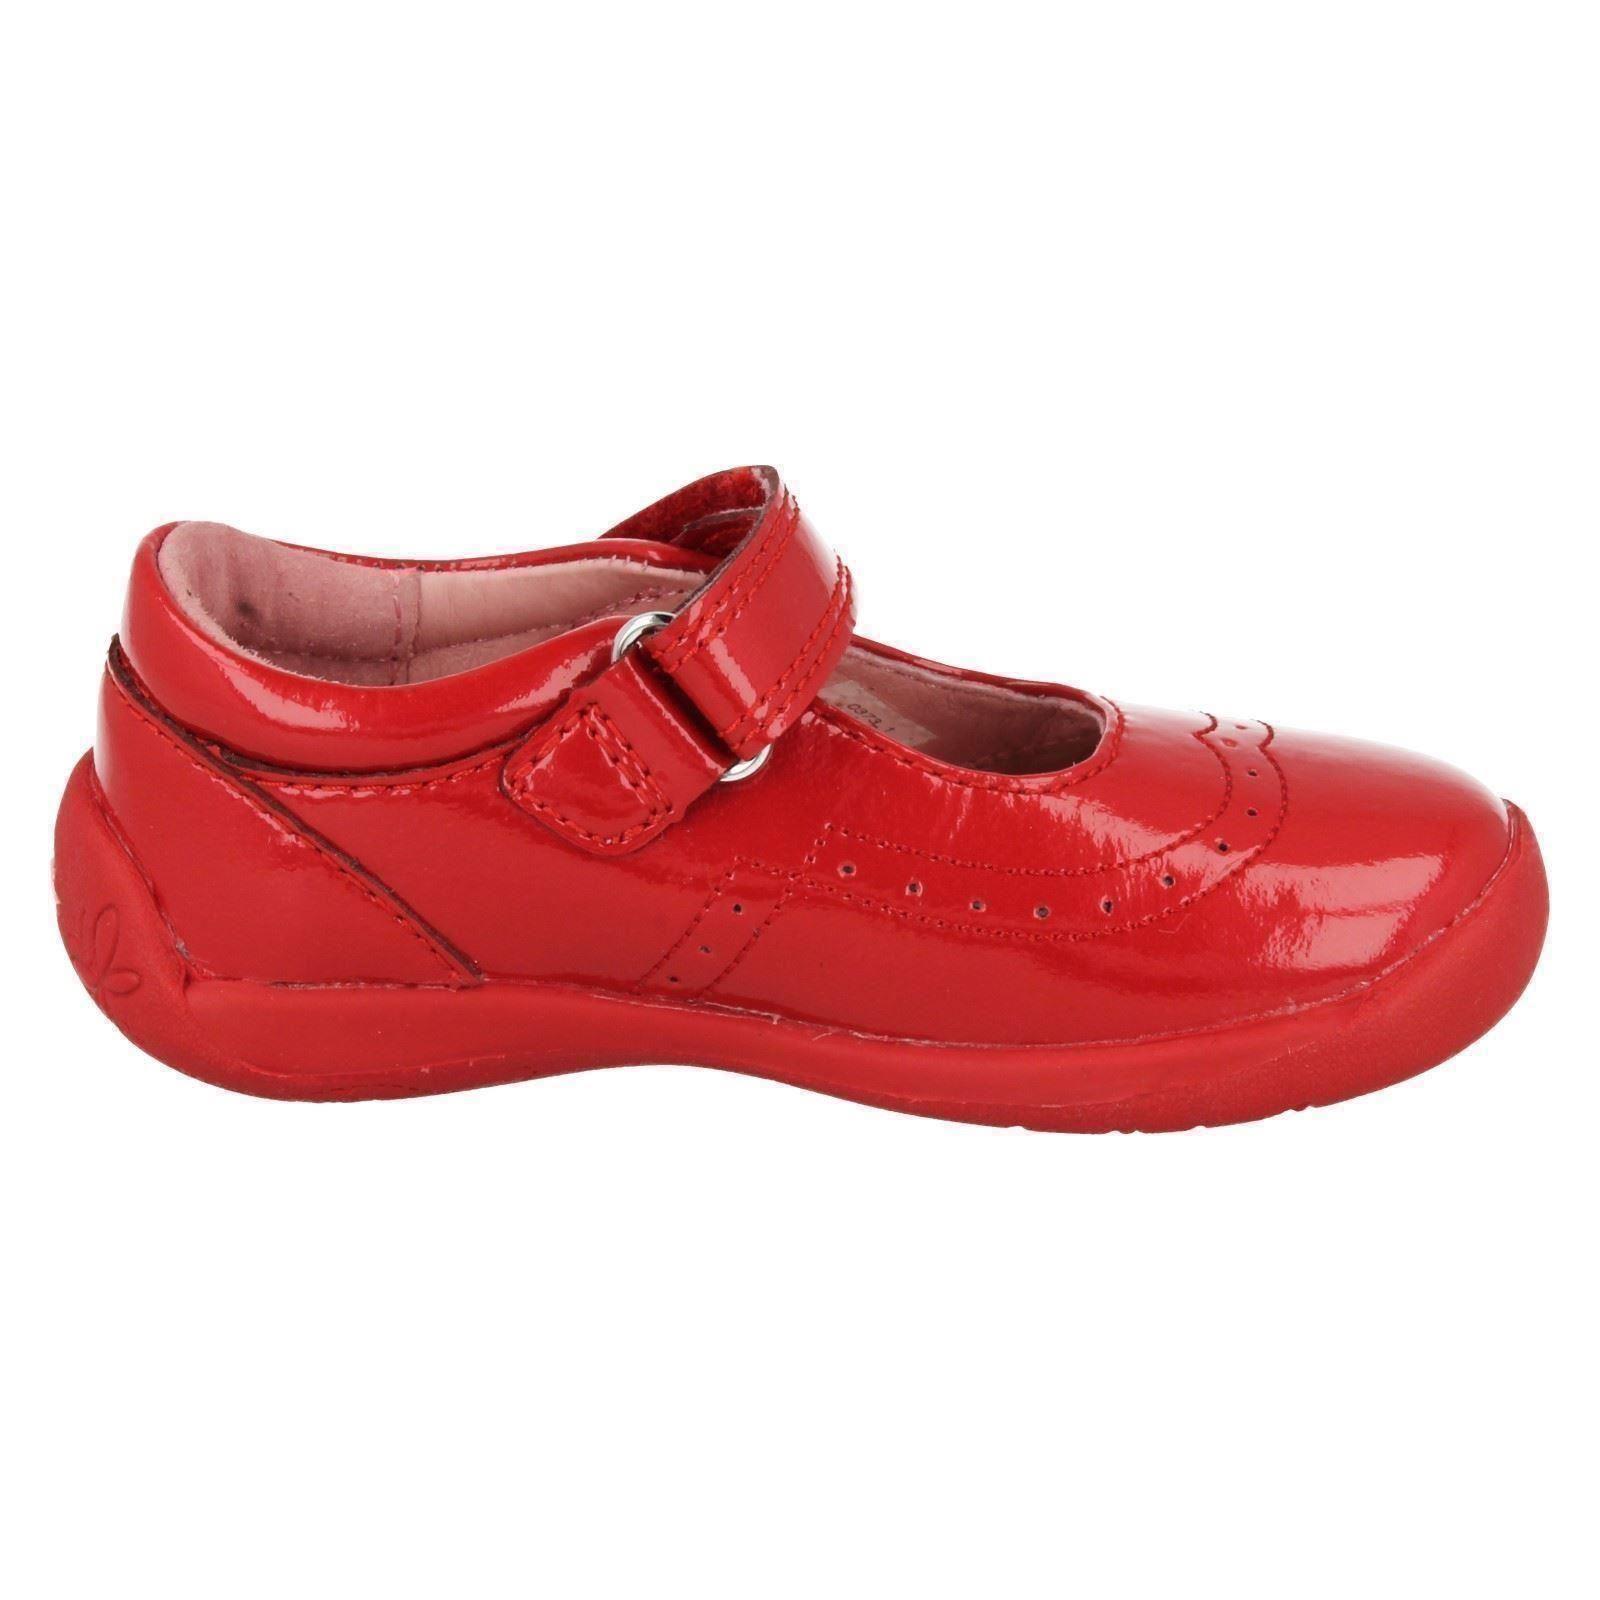 SRSS Alice Startrite Girls Super Soft Smart Shoes